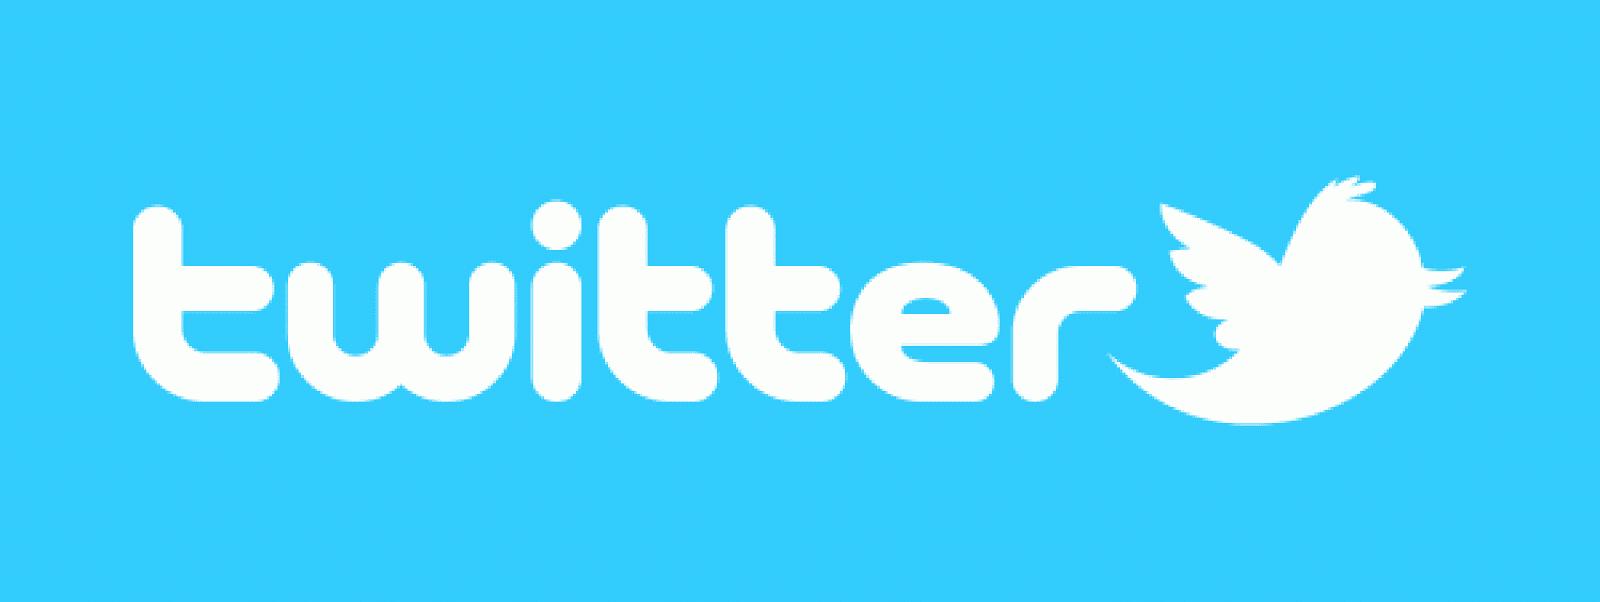 Un tweet !